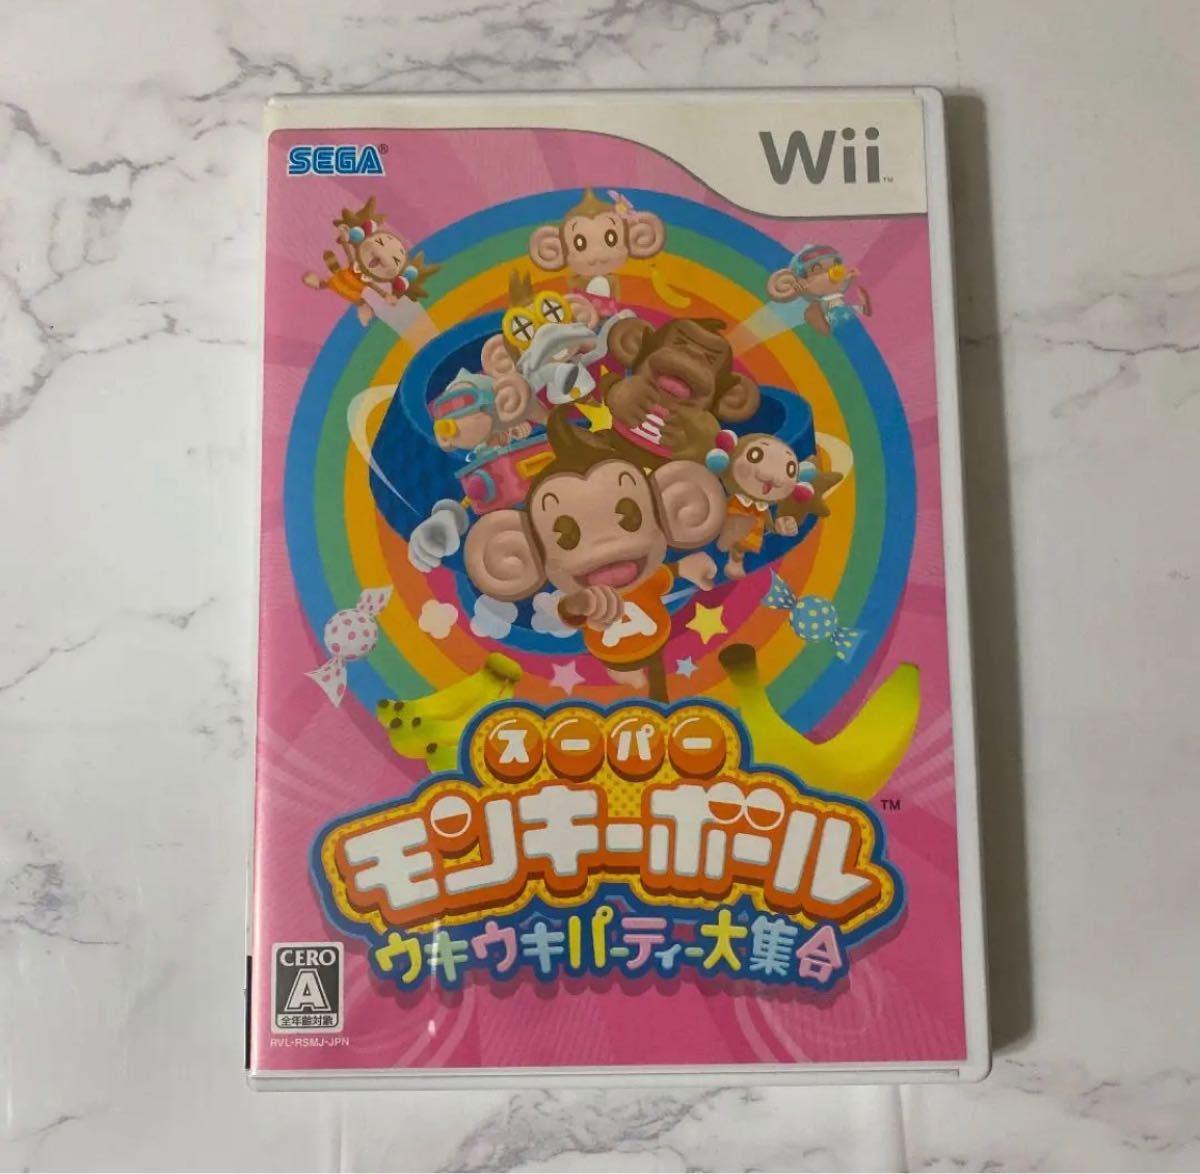 Wii カセット ウィー スーパーモンキーボールウキウキパーティー大集合 Wiiソフト Wii 任天堂